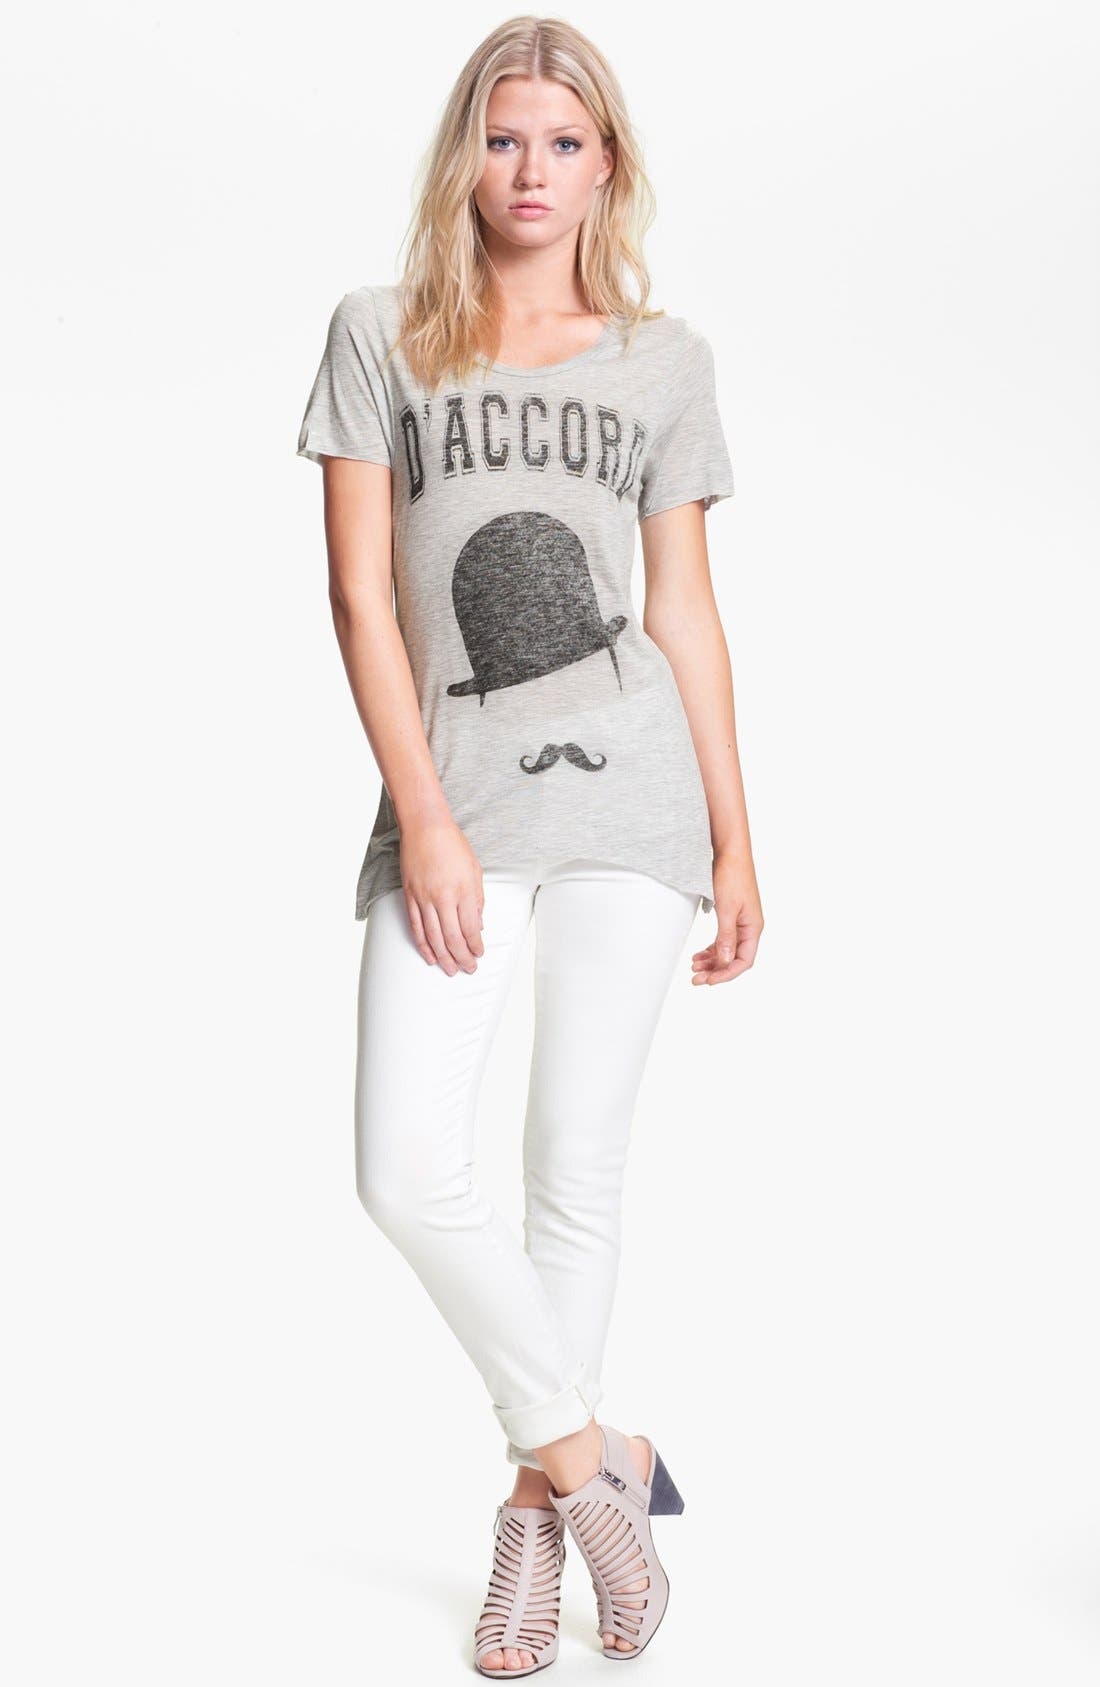 Main Image - Zoe Karssen Tee & J Brand Jeans